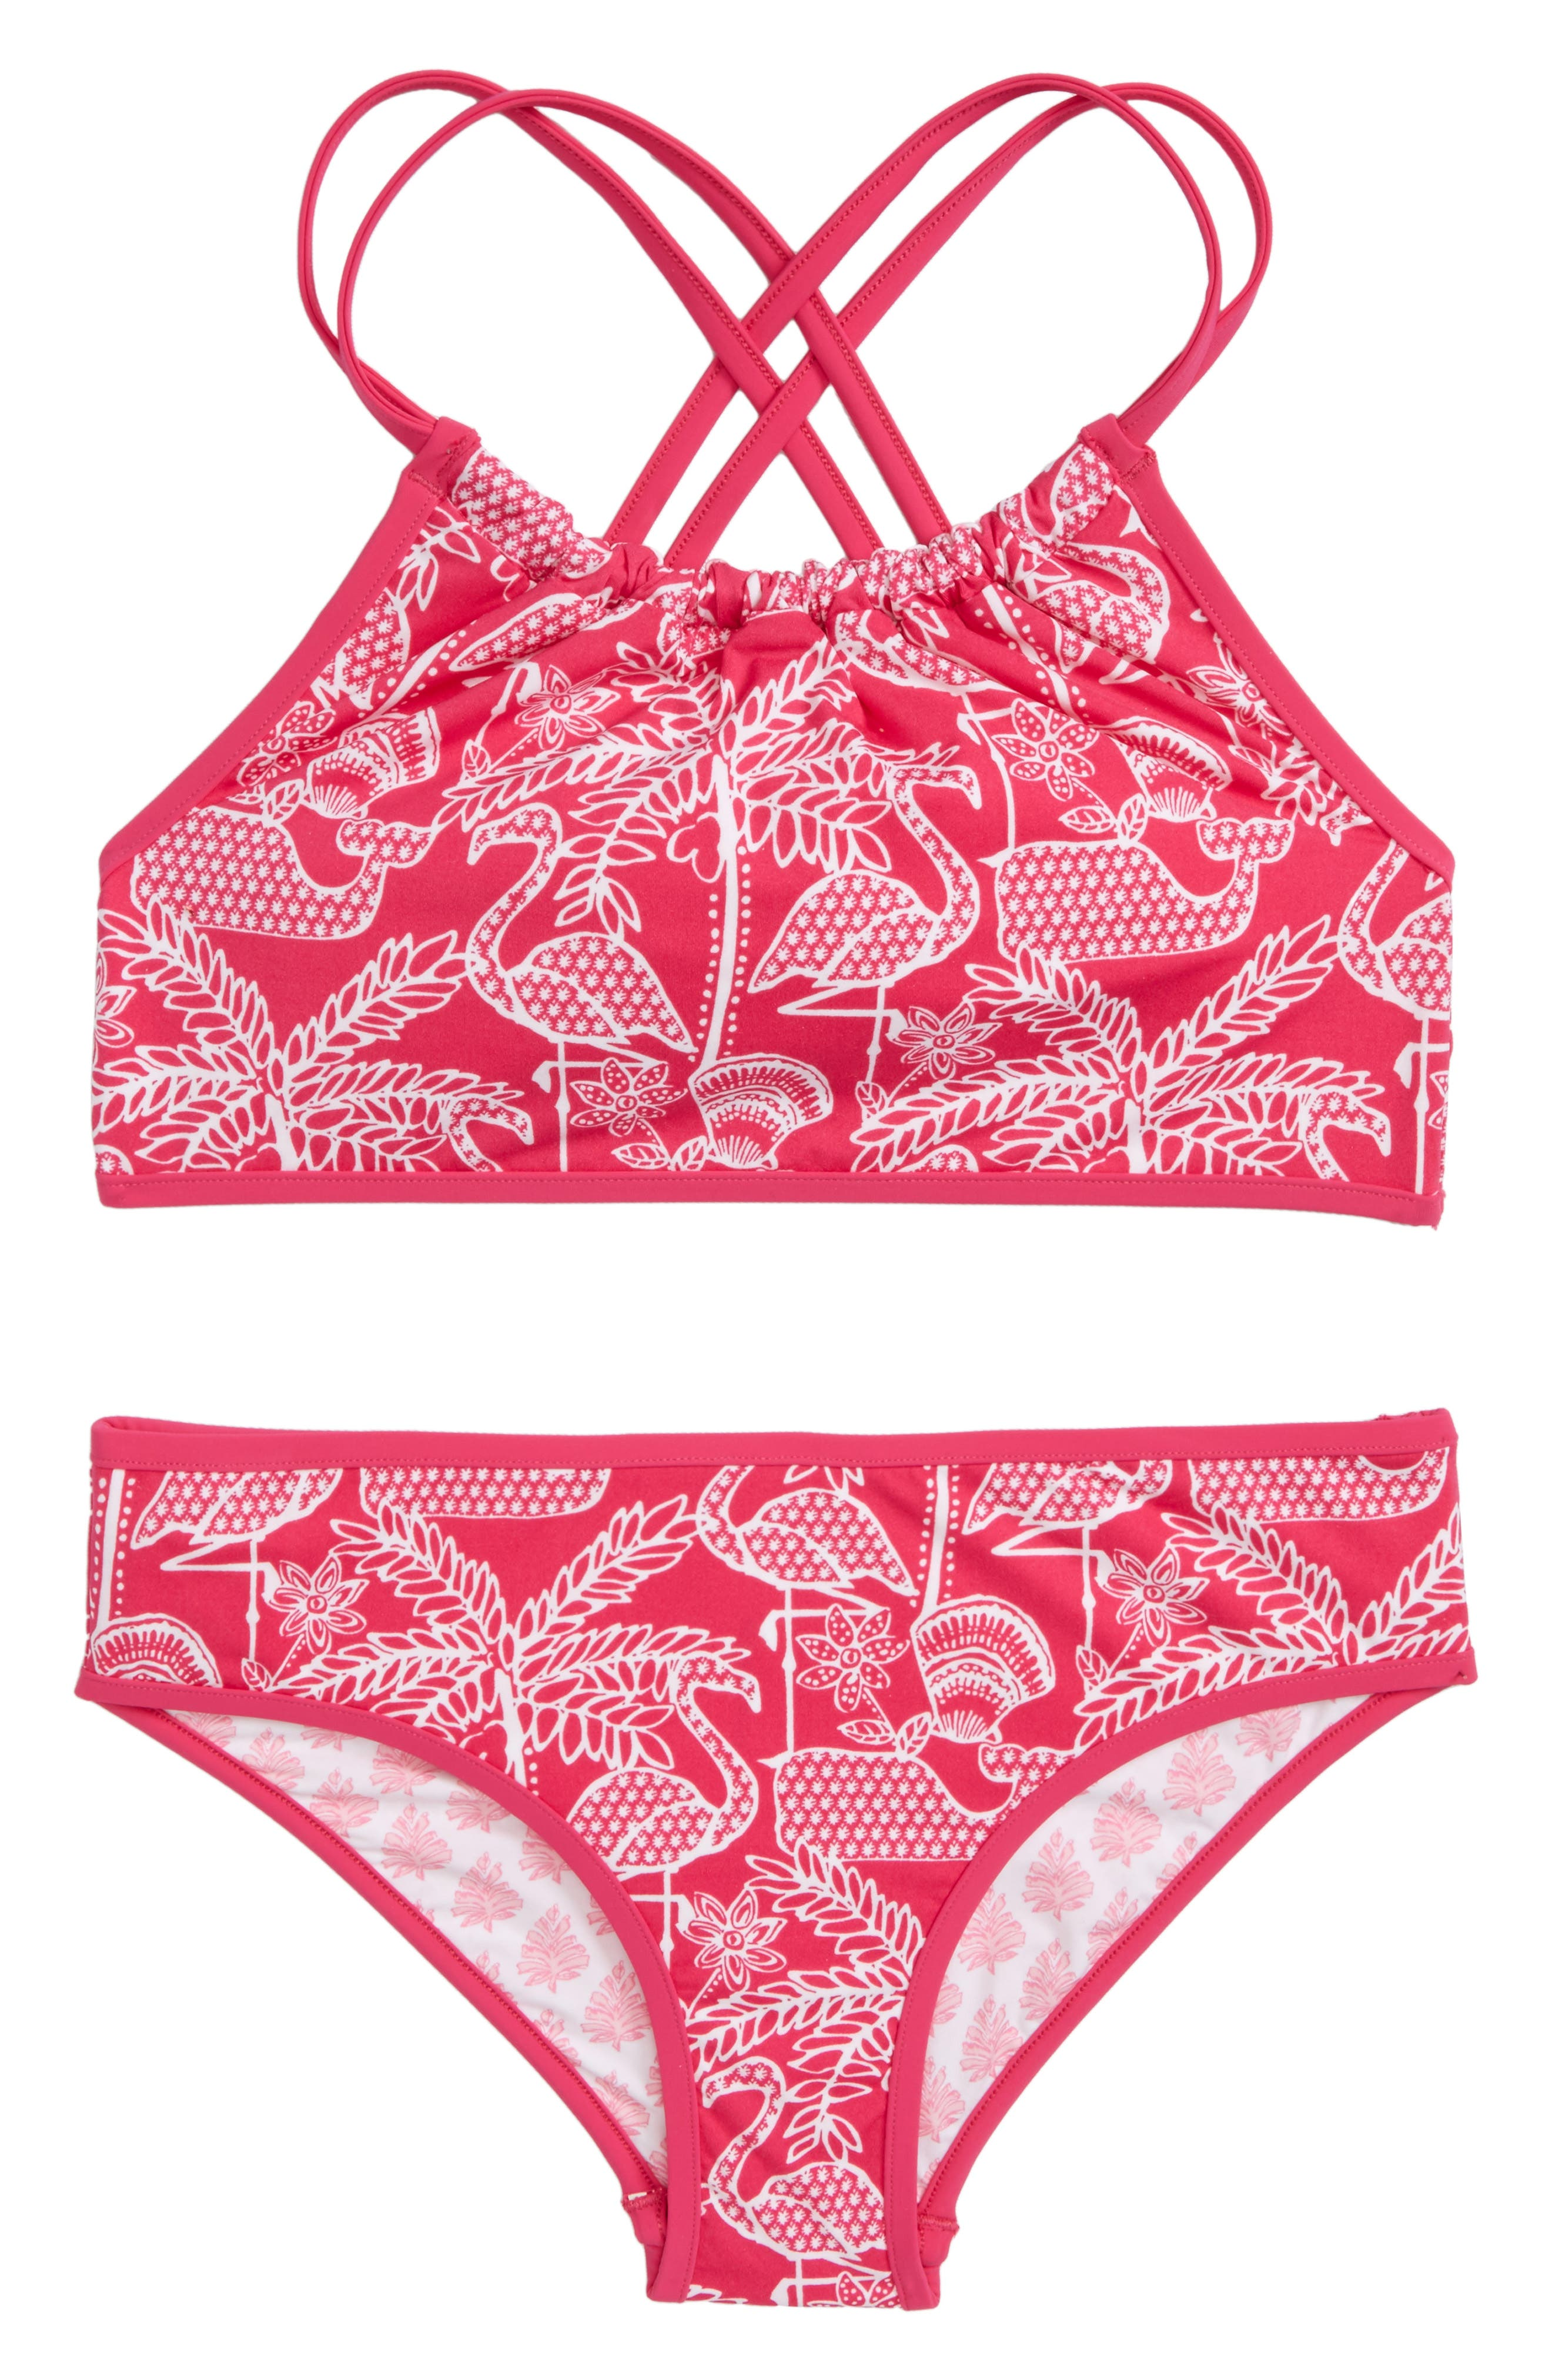 Flamingo Print Reversible Two-Piece Halter Swimsuit,                             Main thumbnail 1, color,                             658